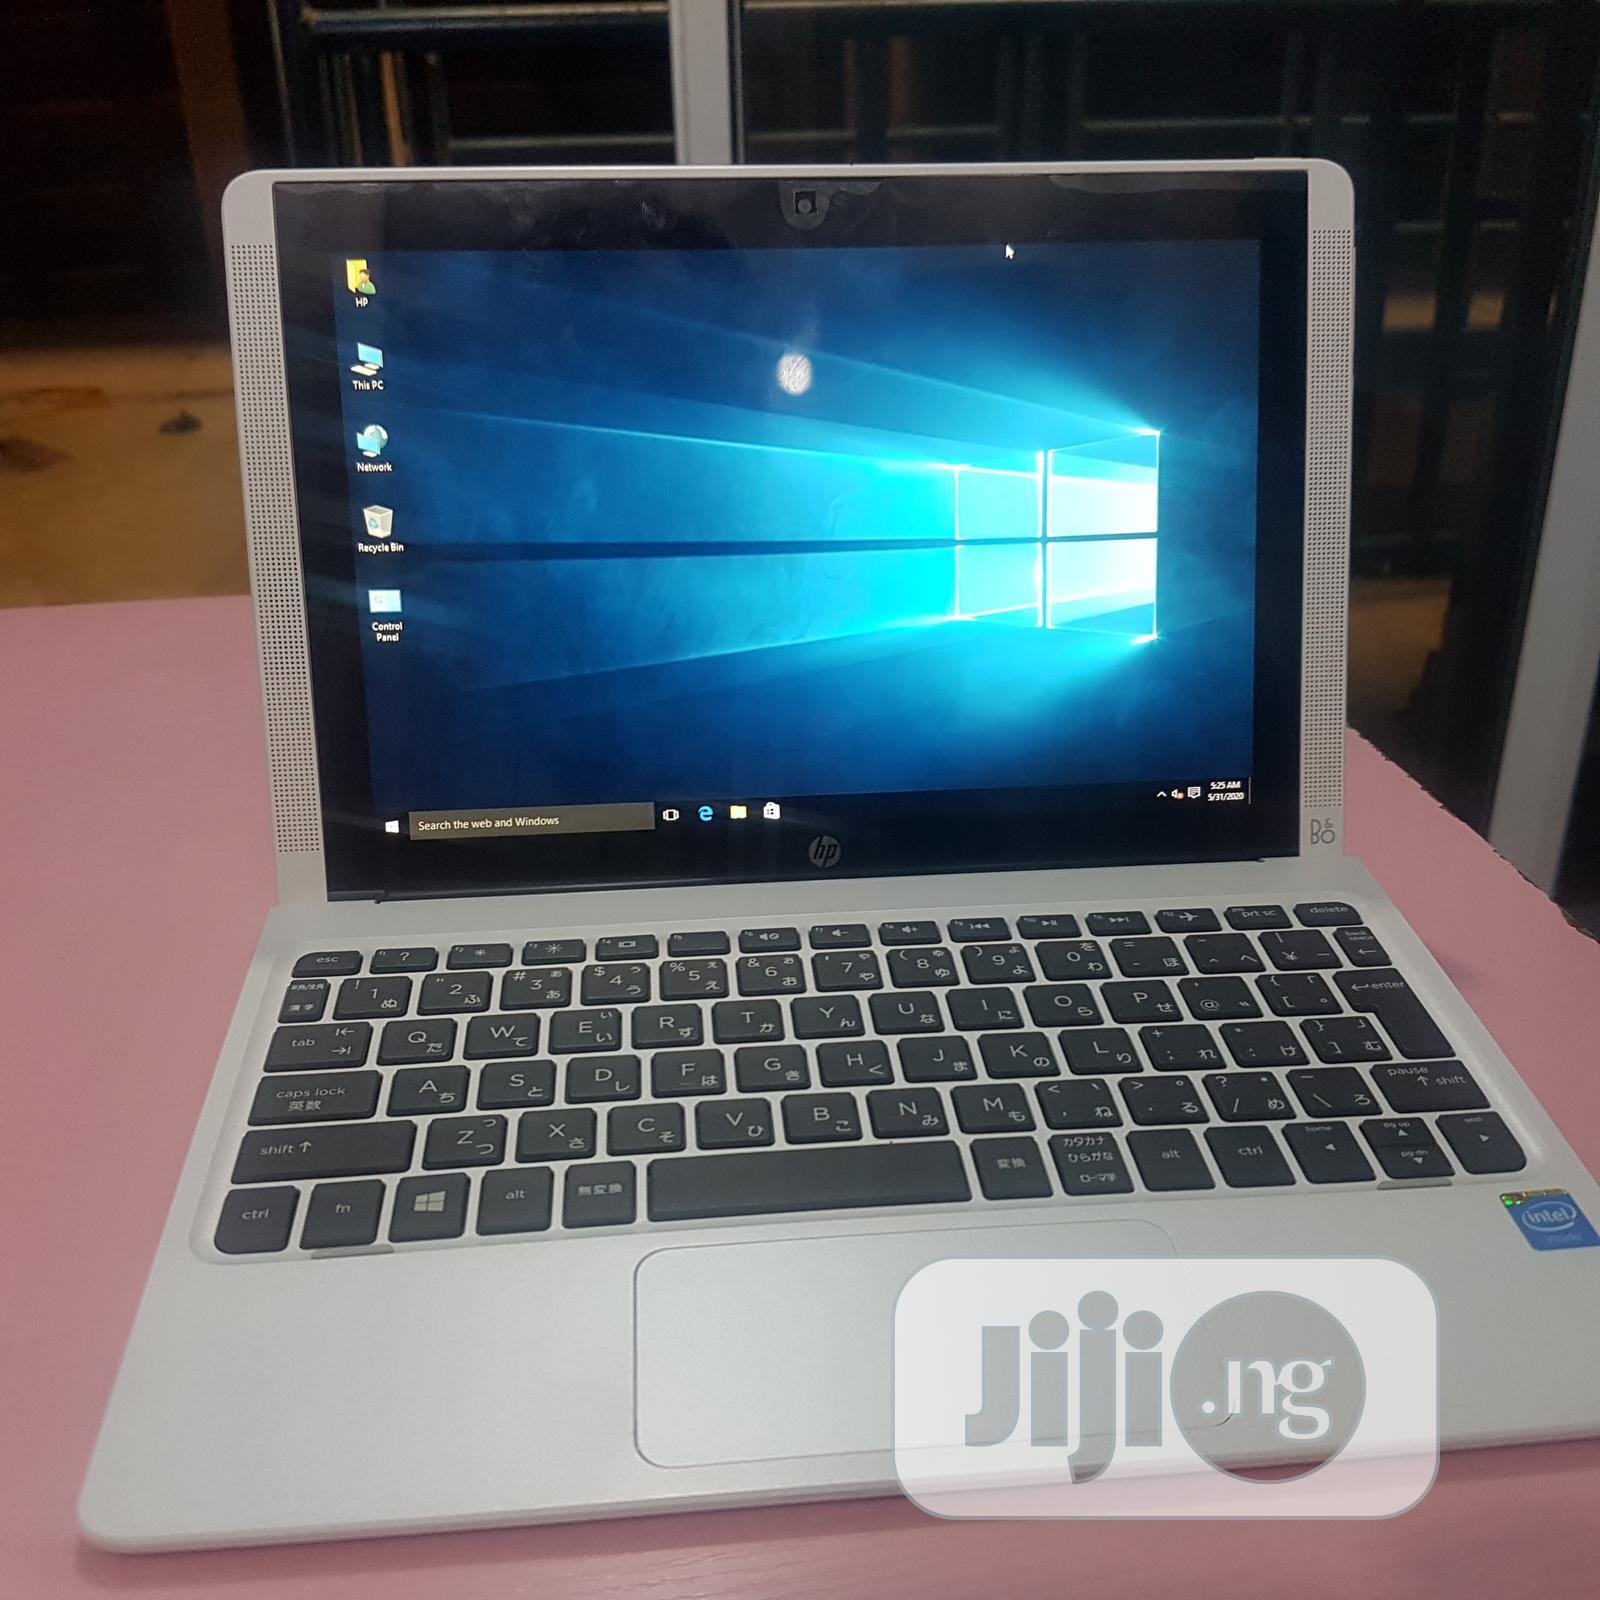 Laptop Hp Pavilion X2 10 2gb Intel Atom Ssd 60gb In Onitsha Laptops Computers Kelvin Jiji Ng For Sale In Onitsha Buy Laptops Computers From Kelvin On Jiji Ng